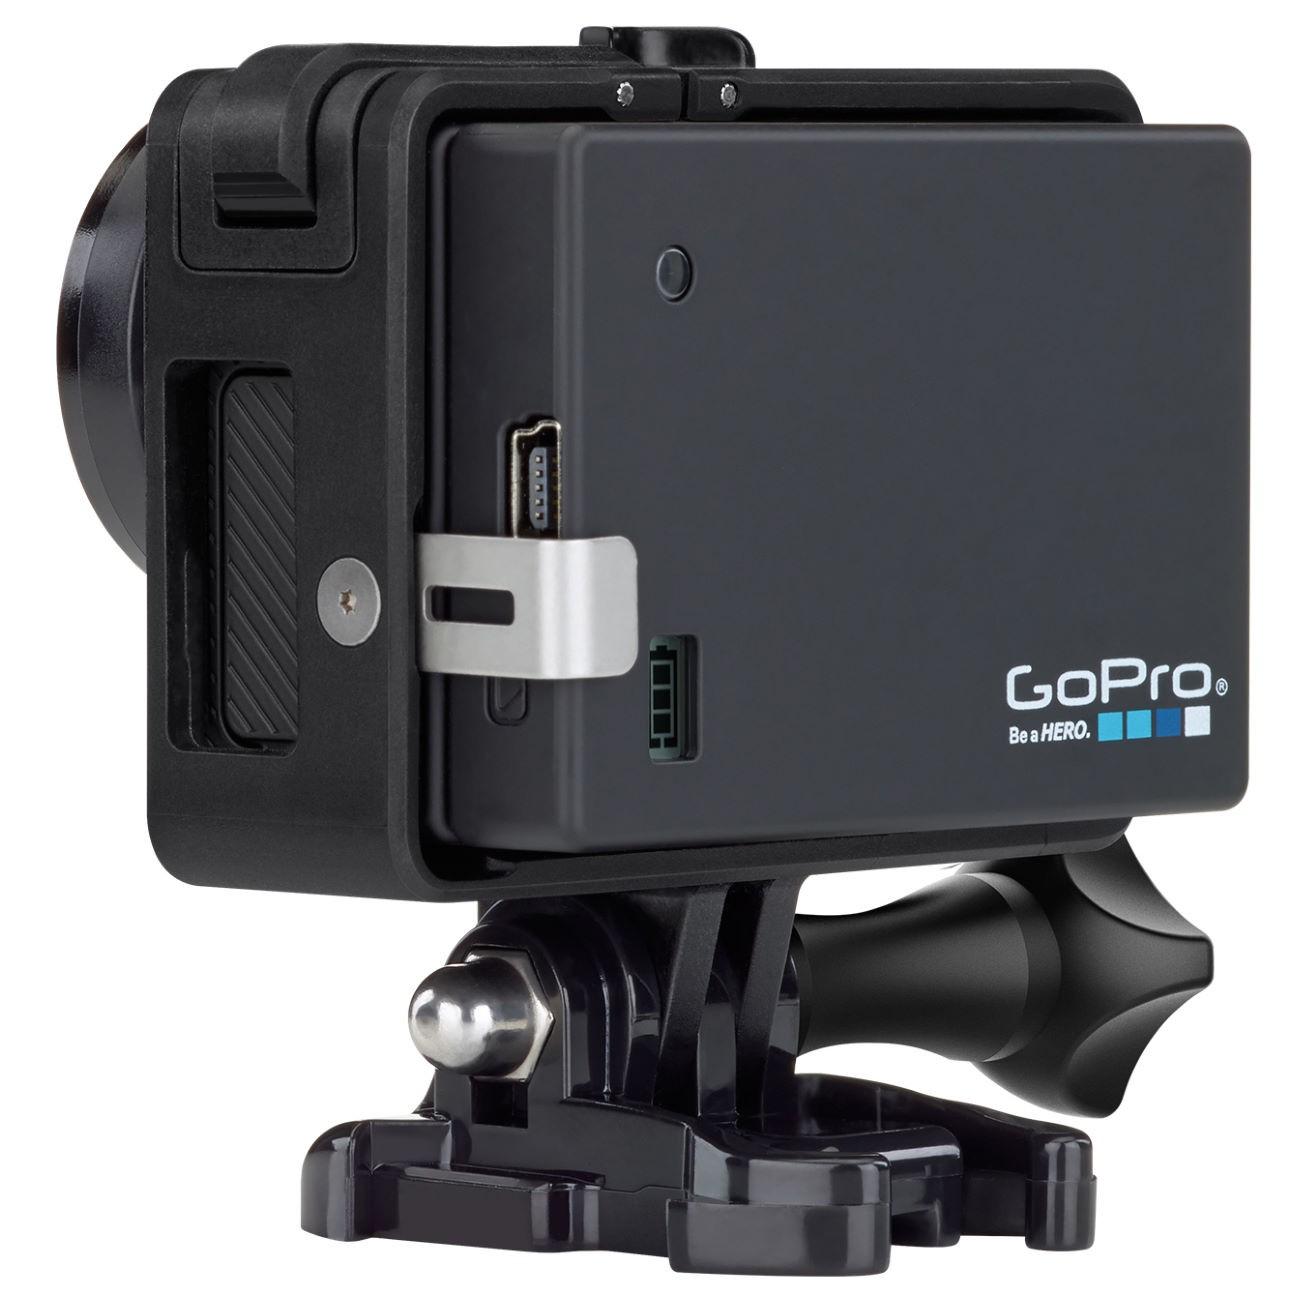 Gopro Go Pro Bateria Bacpac Original Hero4 Abpak-401